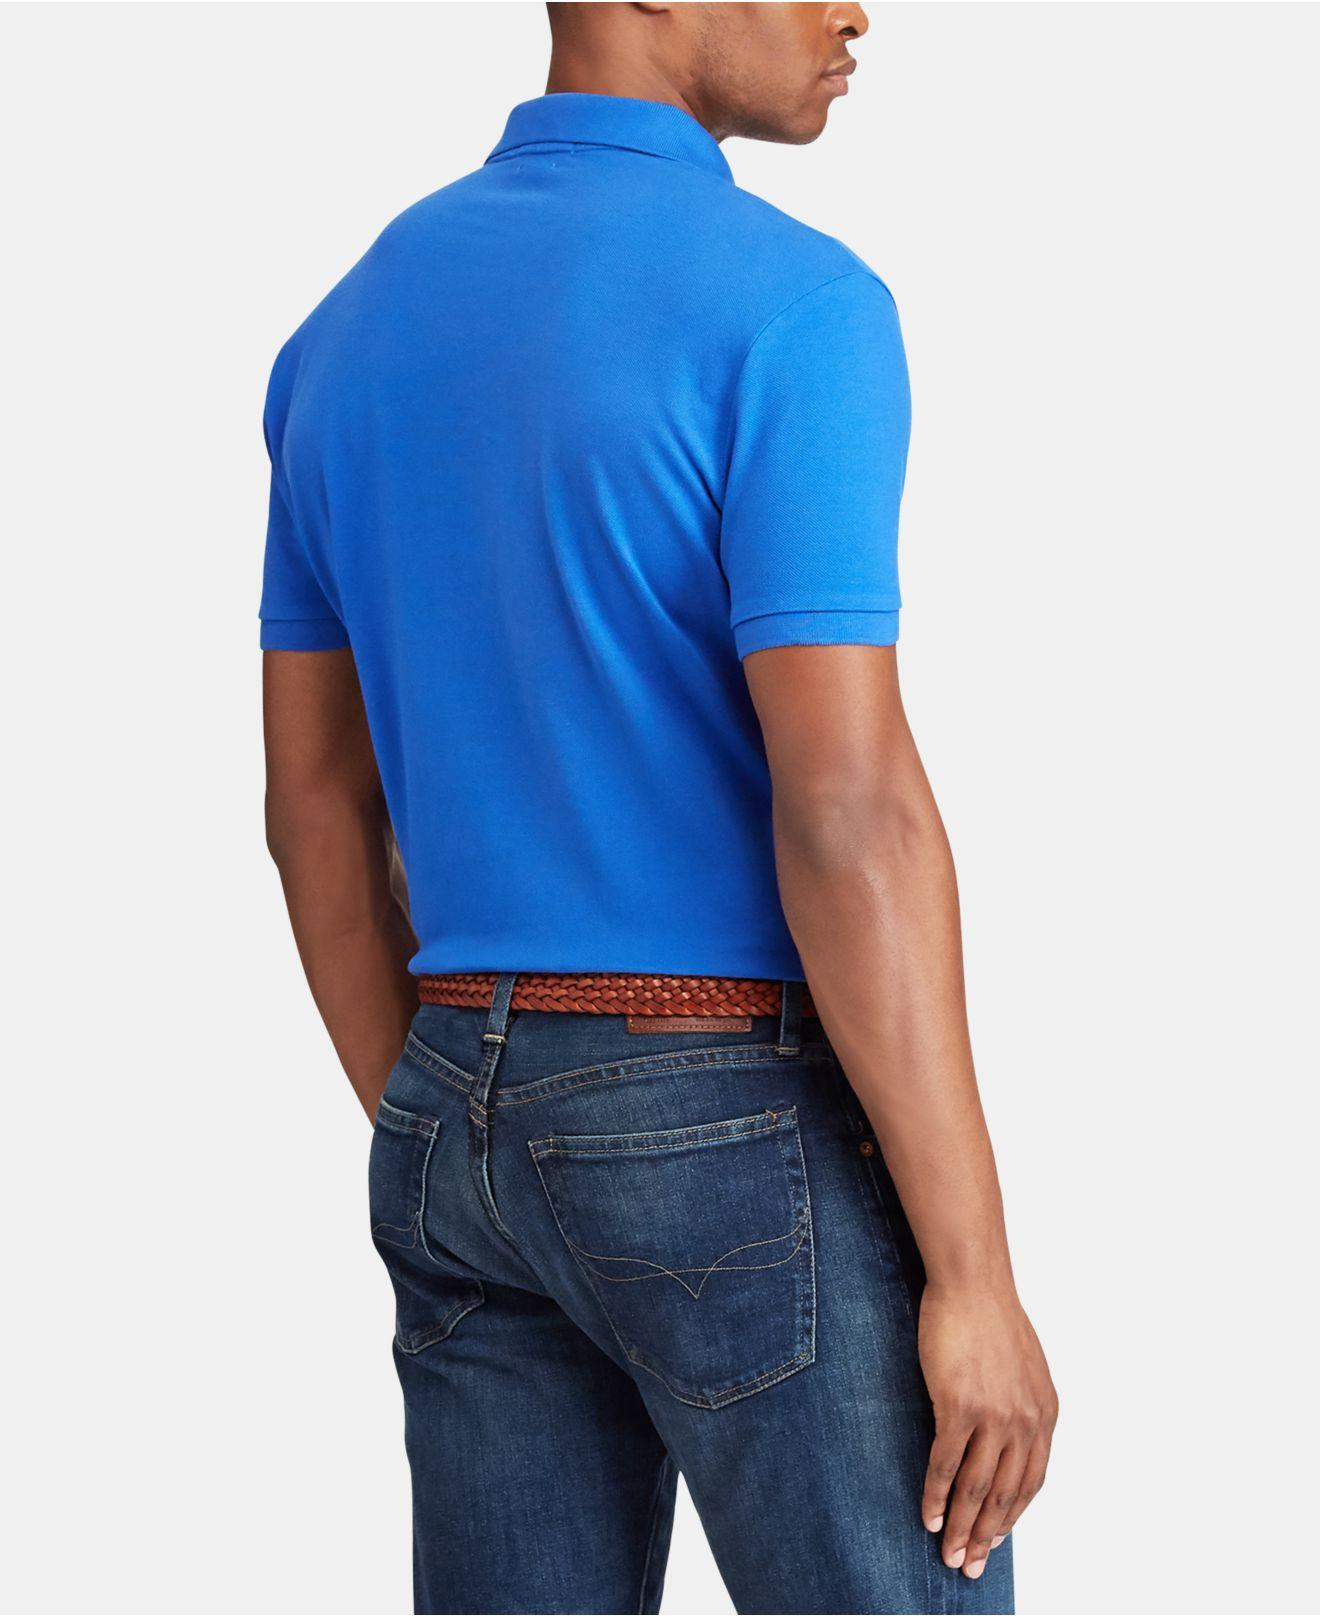 e8216078a3a6 Lyst - Polo Ralph Lauren Custom Slim Fit Polo in Blue for Men